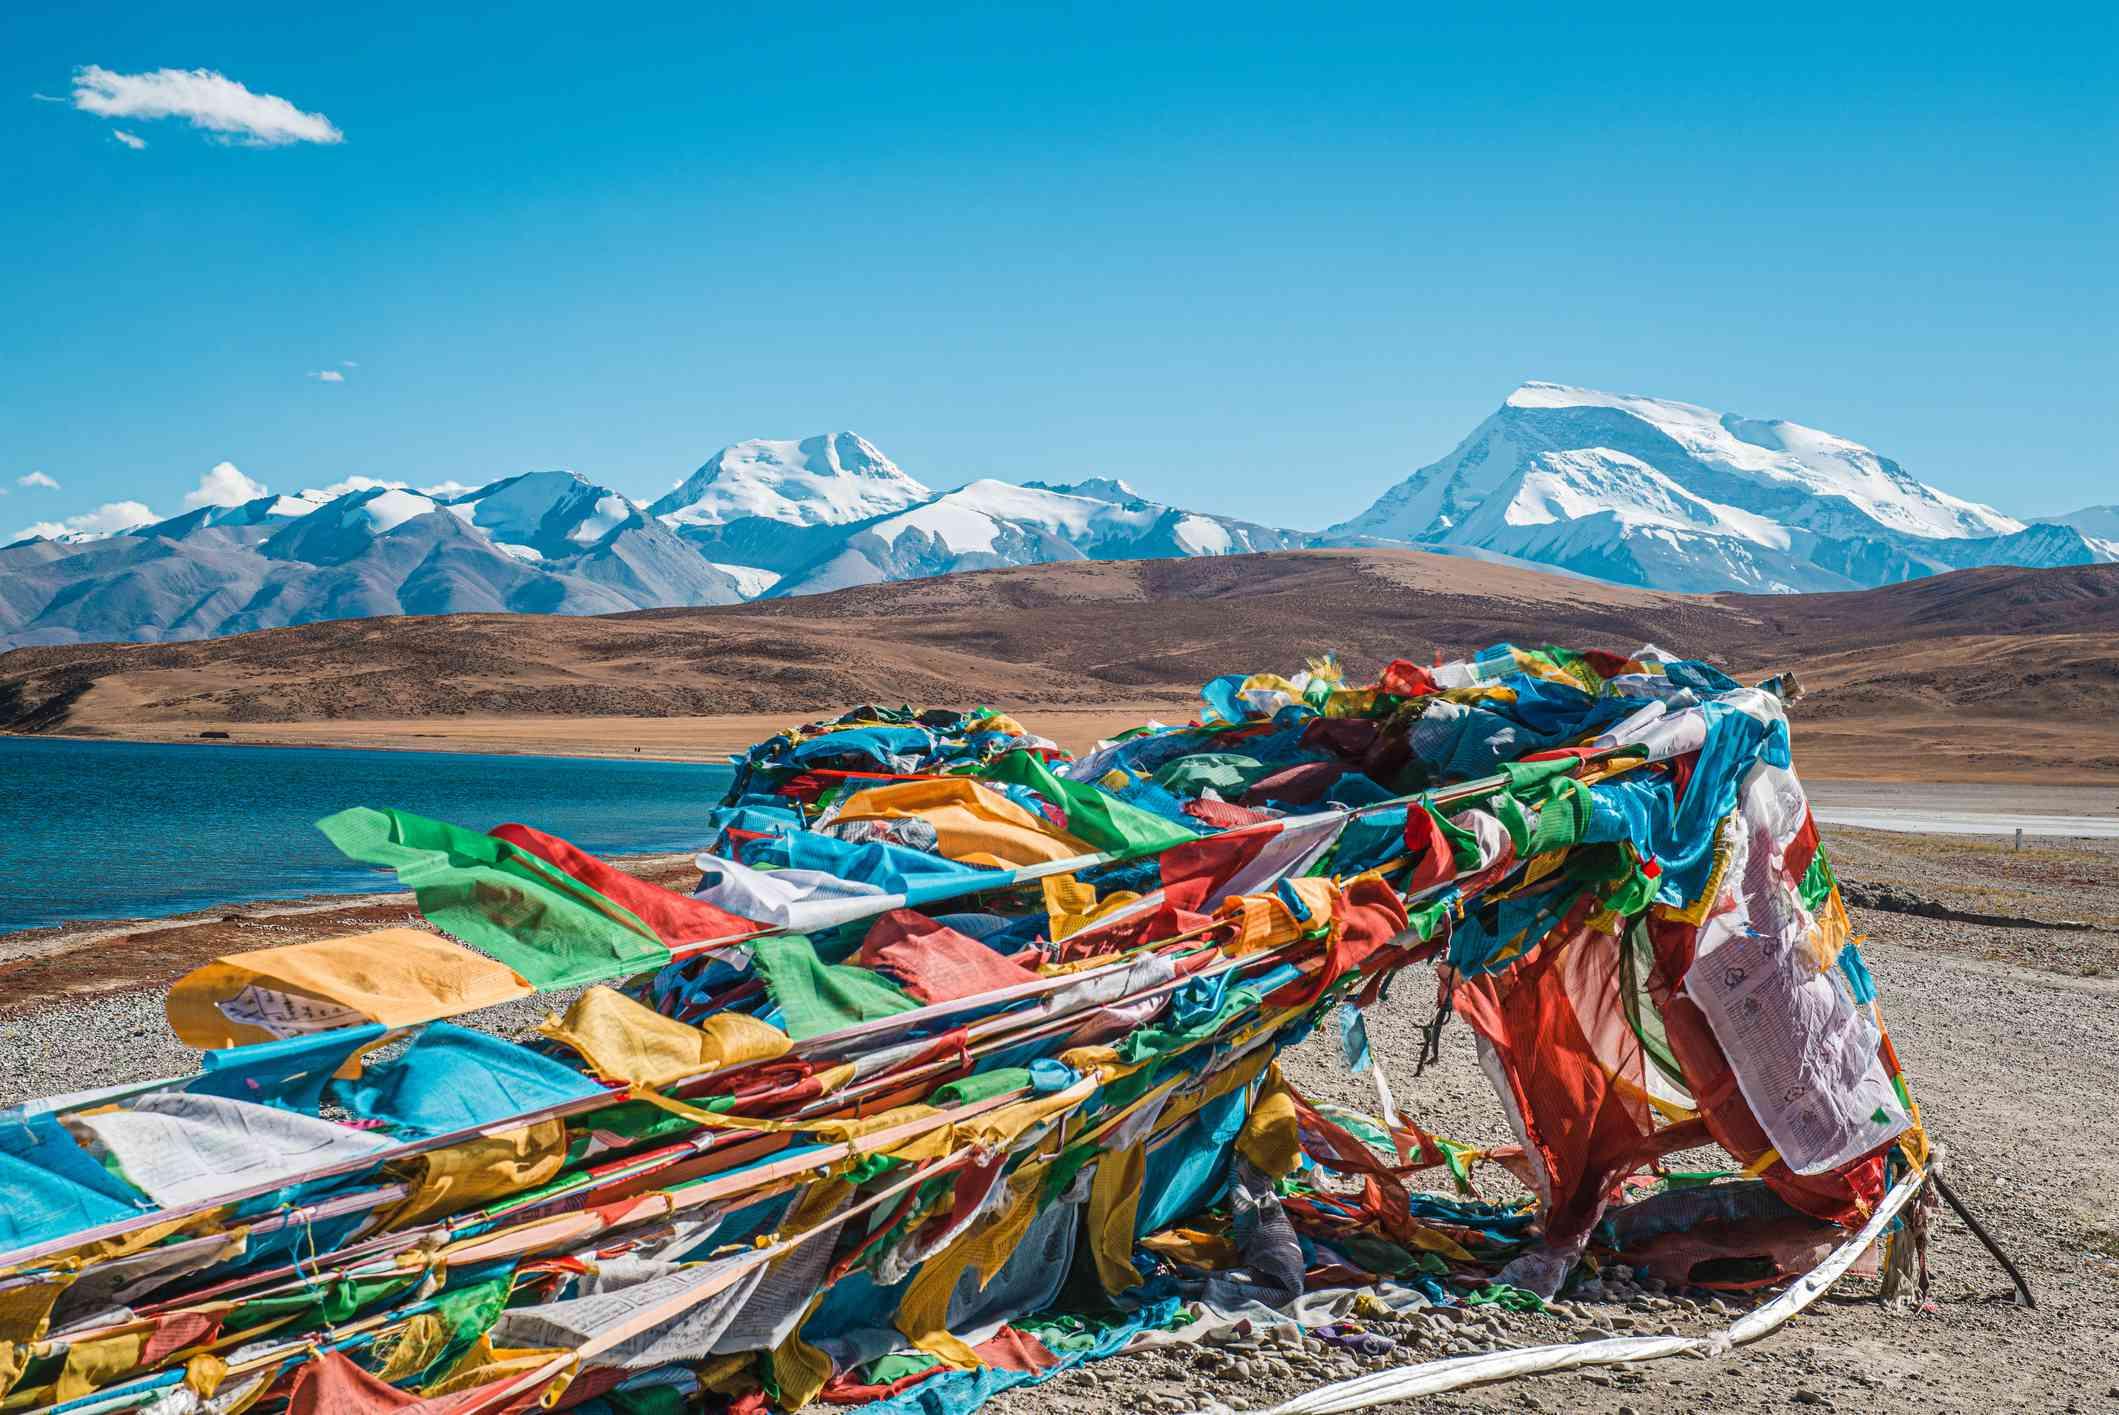 snowy mountains lake and colorful Tibetan prayer flags